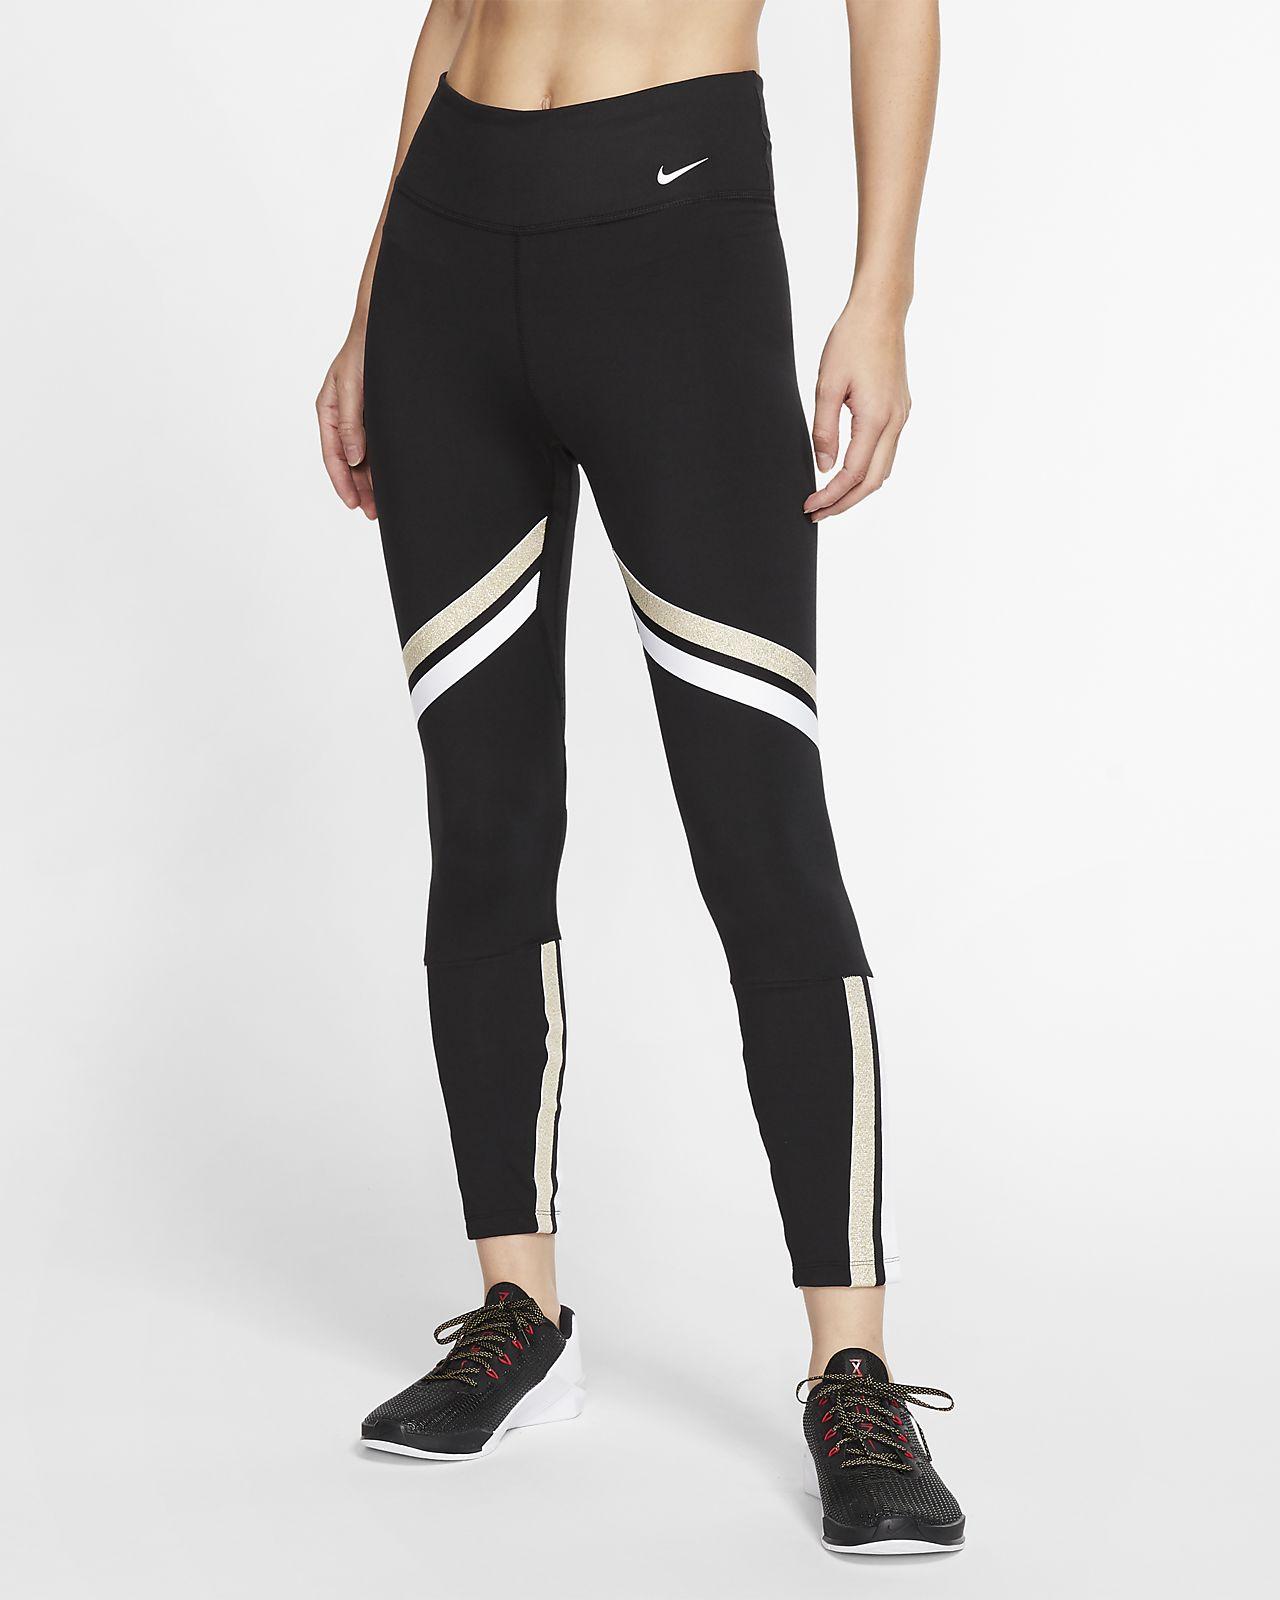 Nike One Icon Clash 78 Tights für Damen